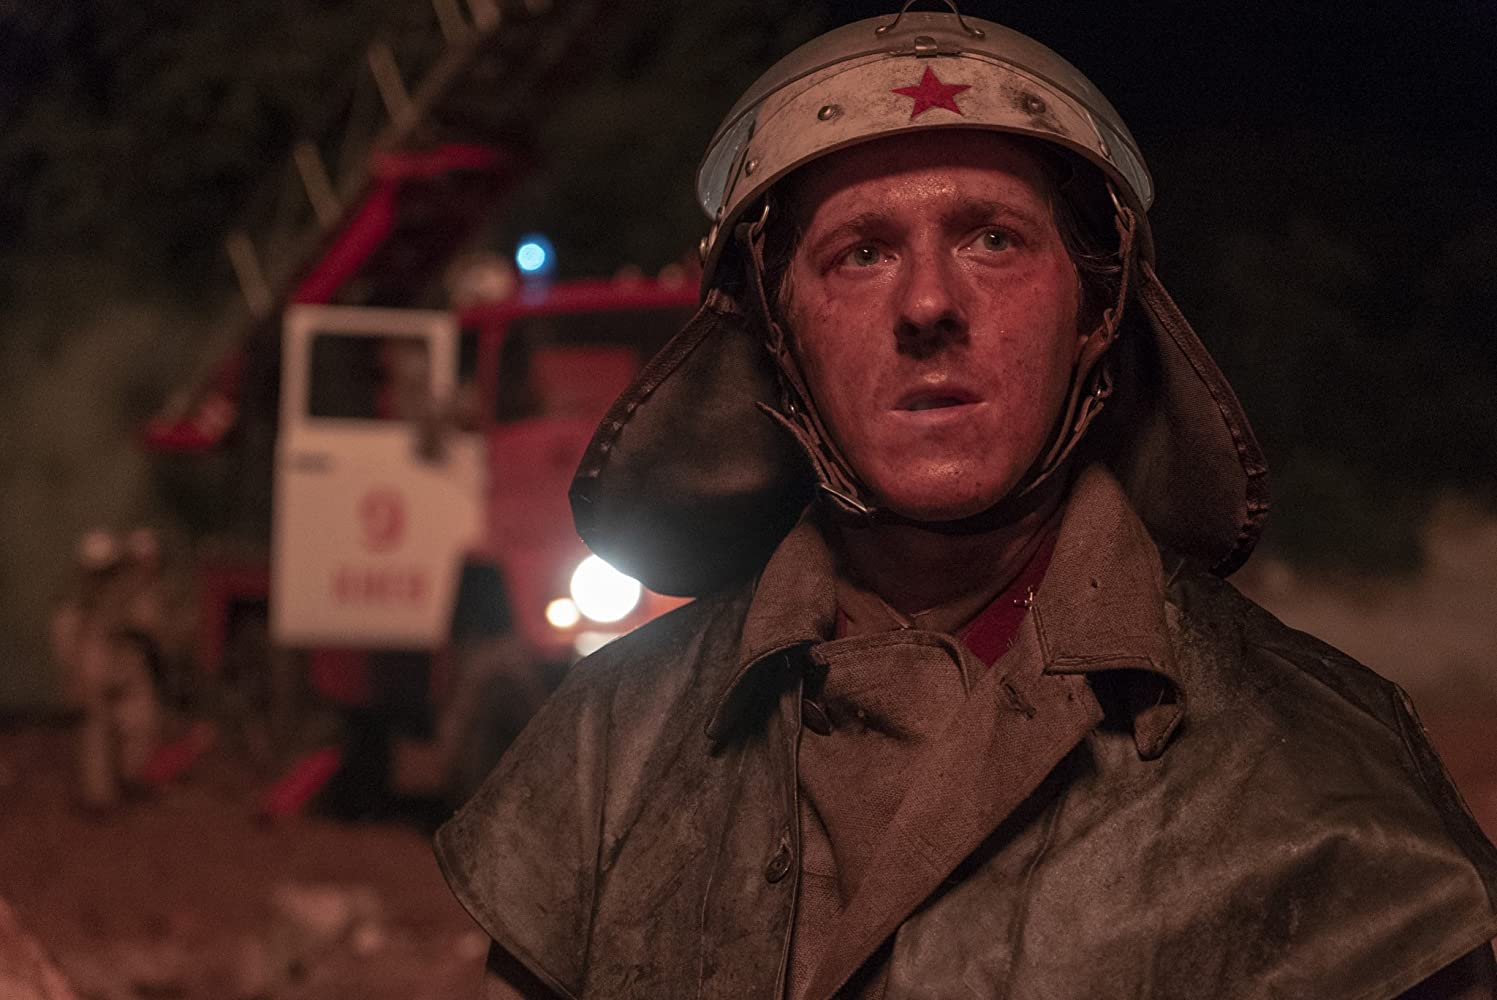 Adam Nagaitis in Chernobyl (2019)